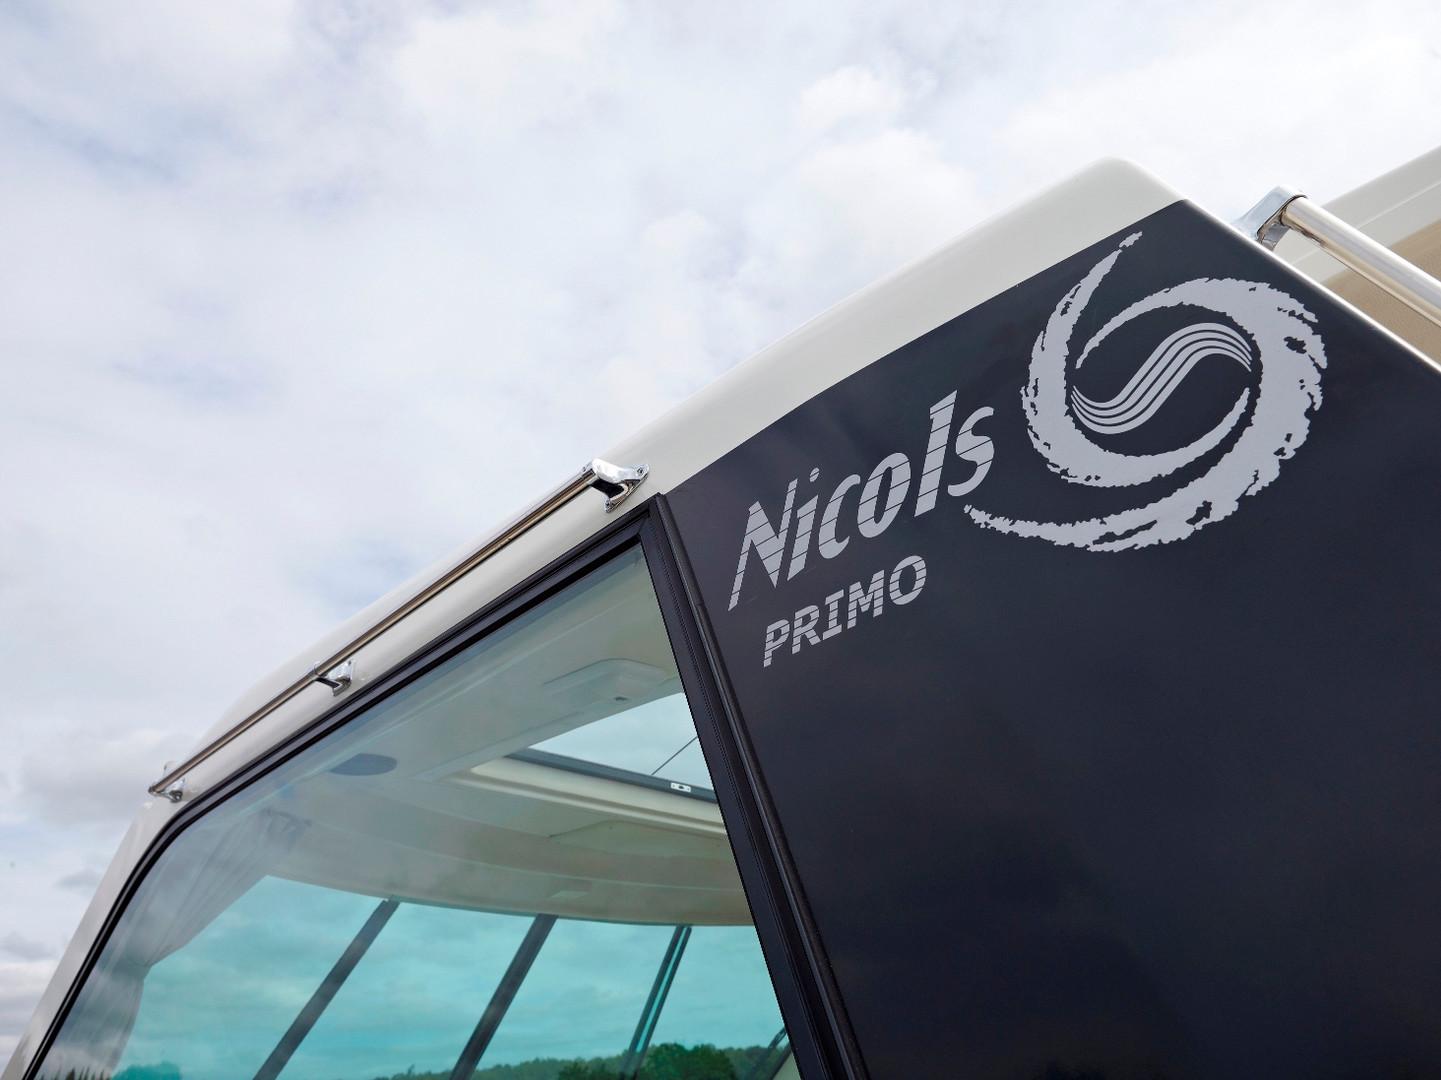 Nicols Primo